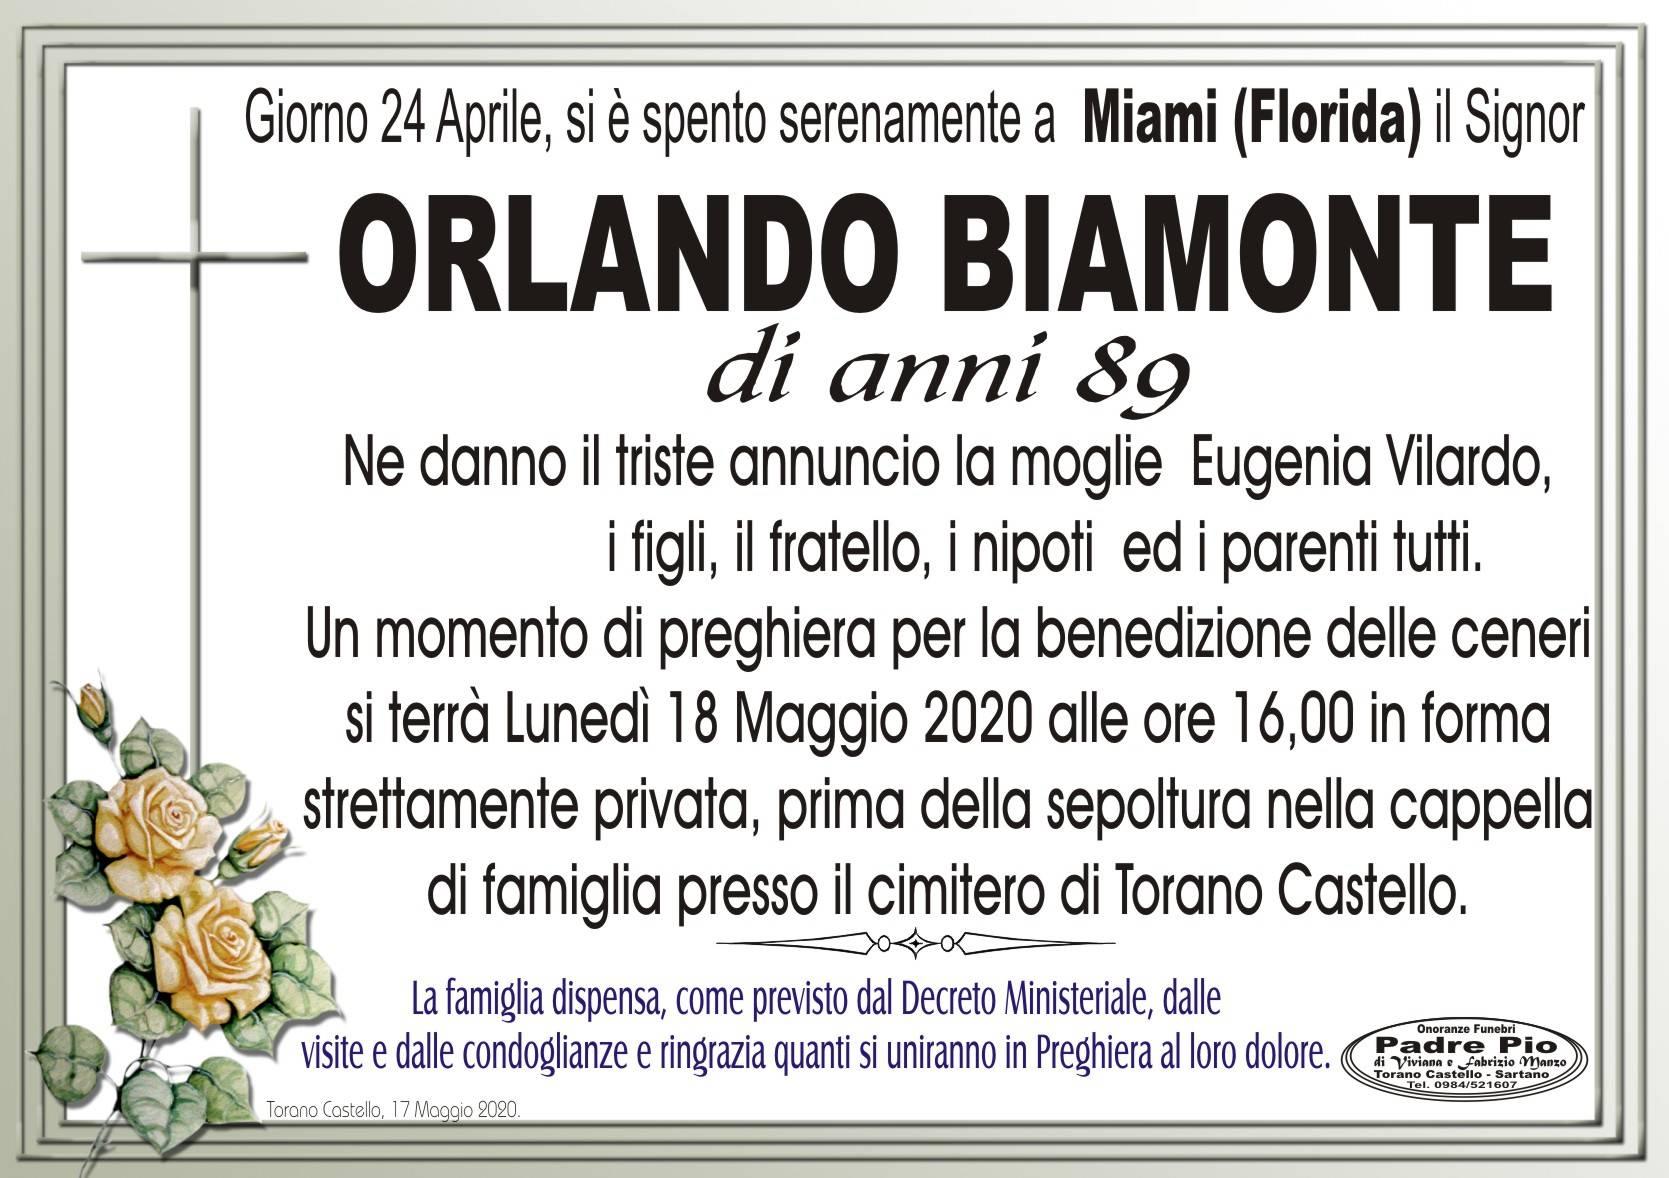 Orlando Biamonte